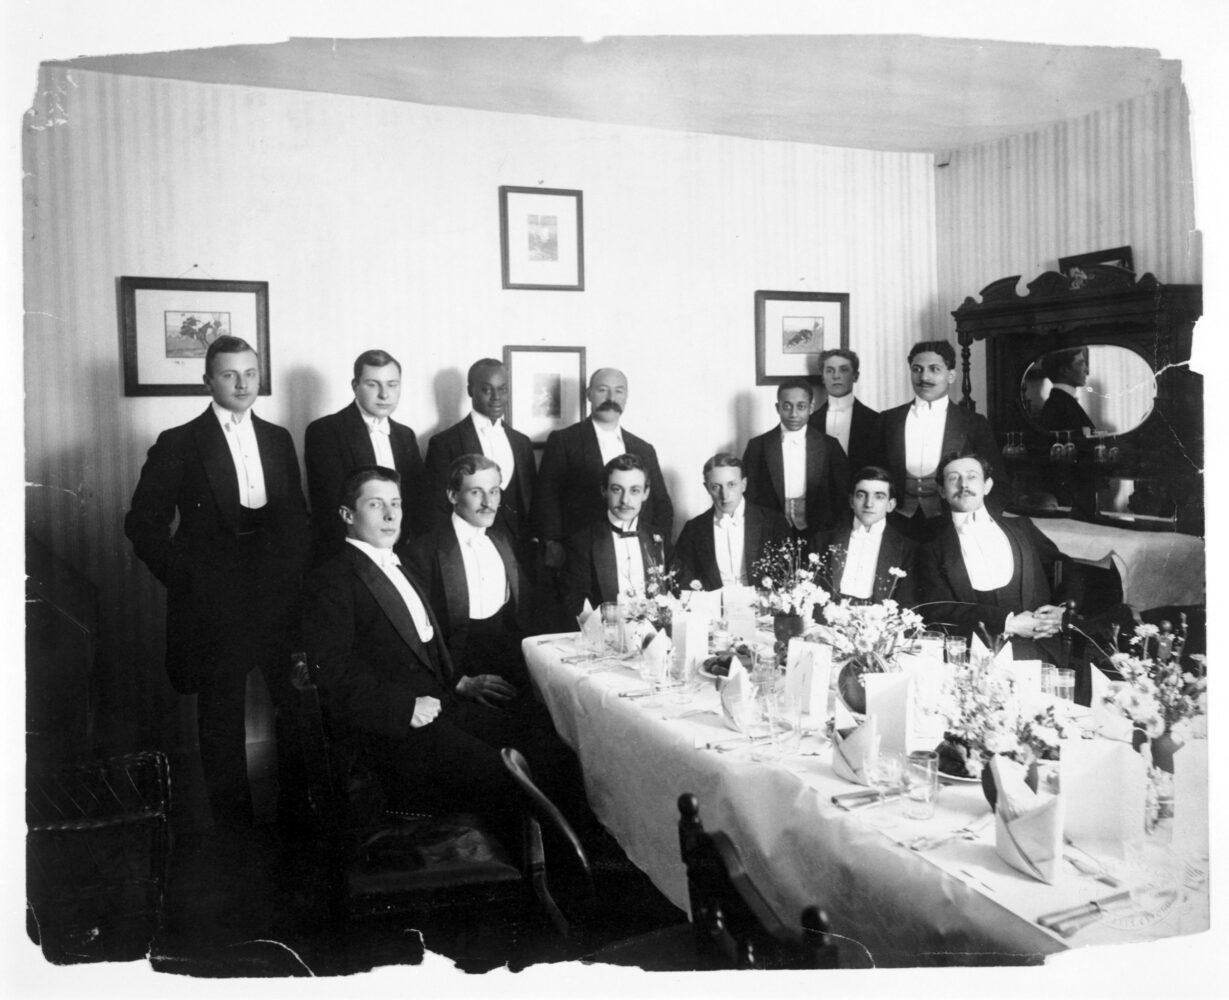 Photograph of Alain Locke at the Cosmopolitan Club, c. 1908: Moorland Spingarn Library, MSS_5317A. Image courtesy of the Moorland-Spingarn Research Center.